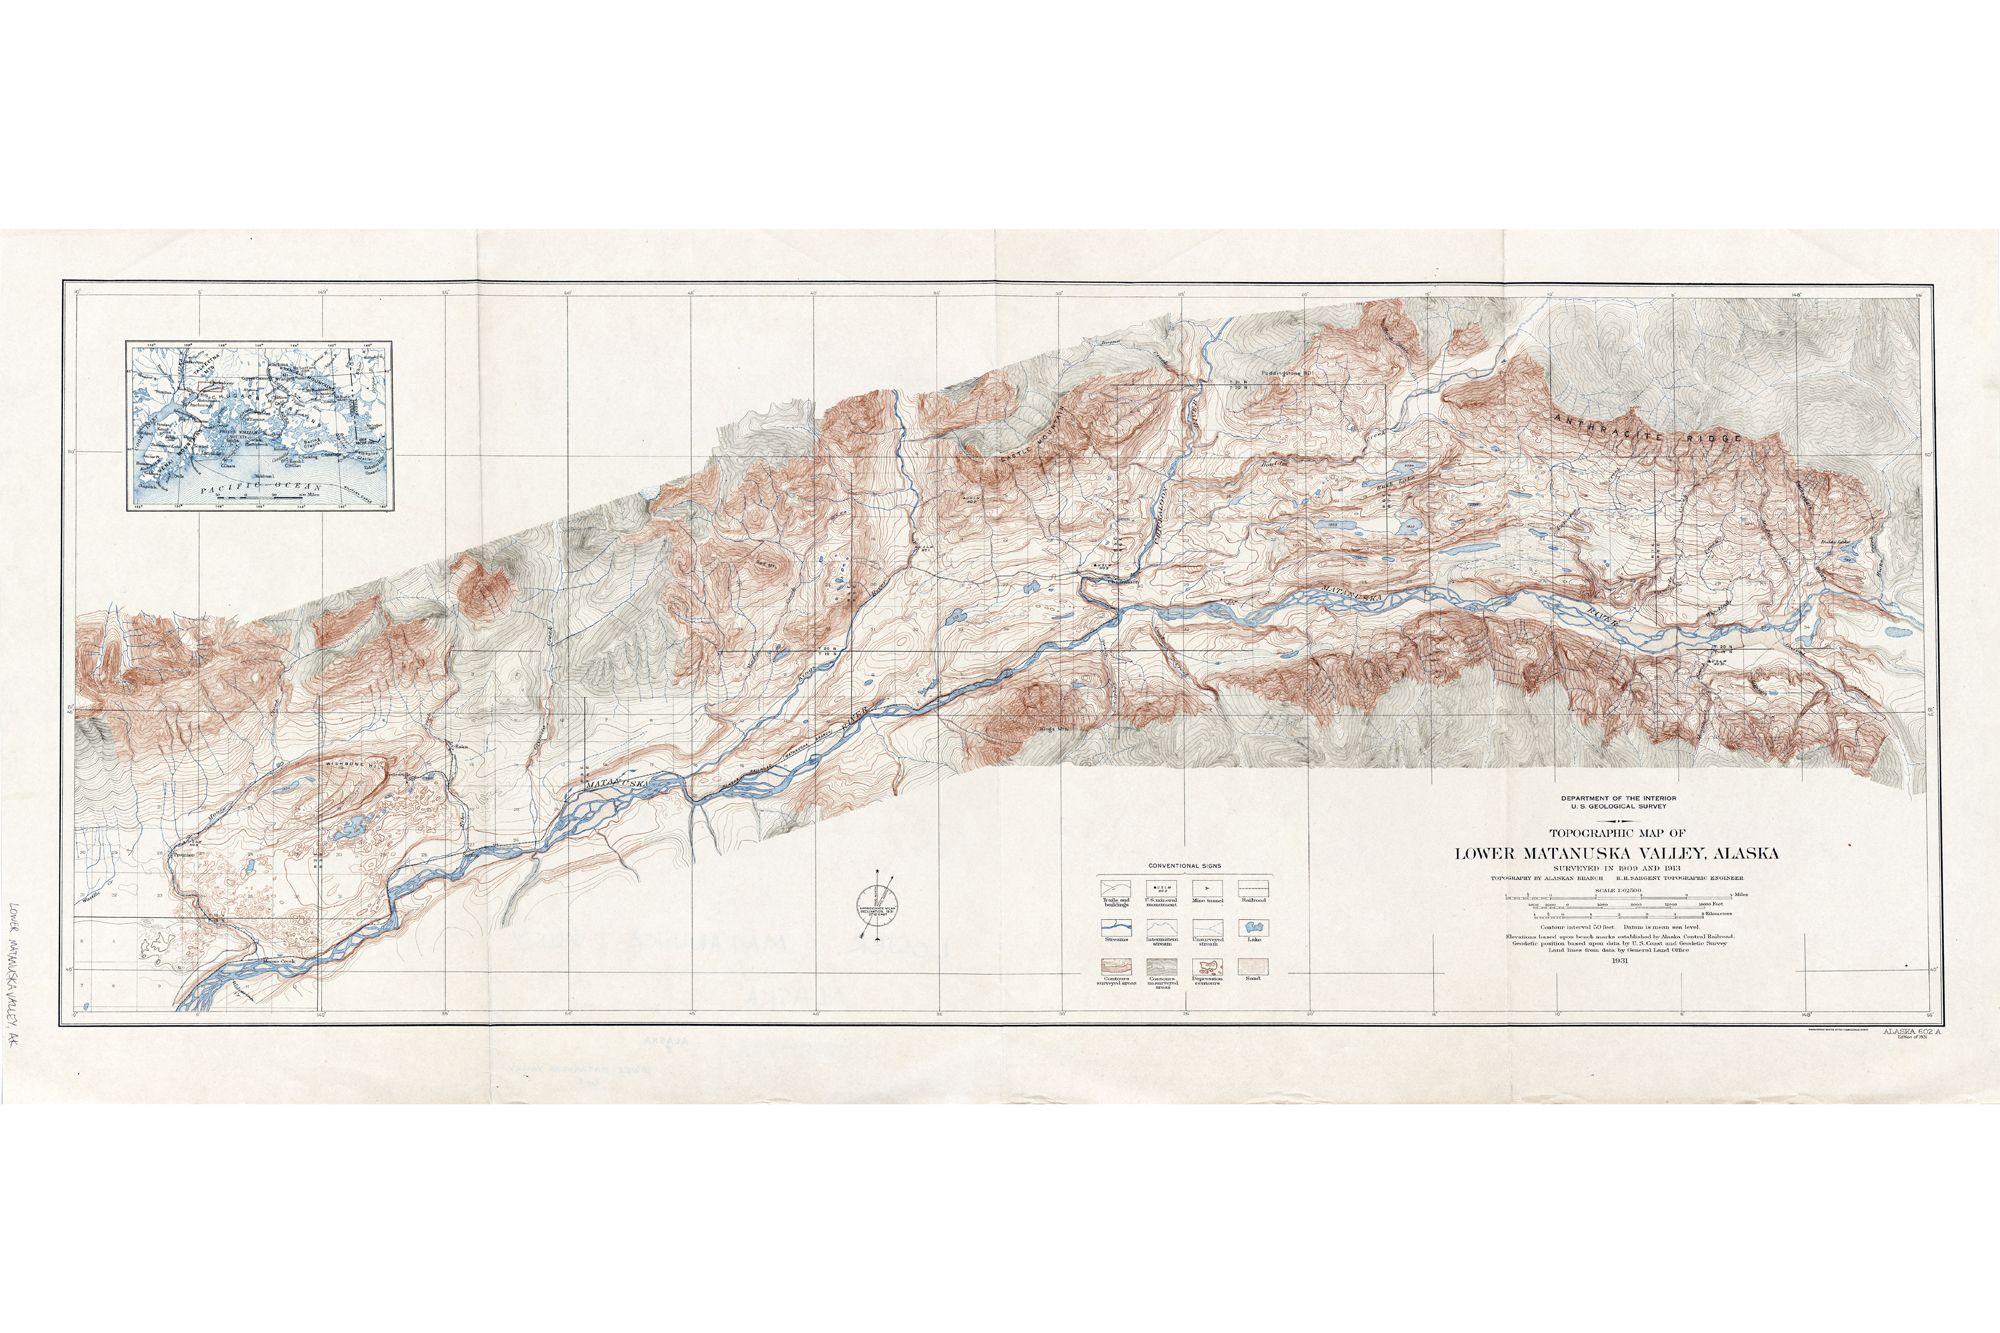 Alaska Topographic Maps, USGS - ATLAS OF PLACES | CARTOGRAPHY ...